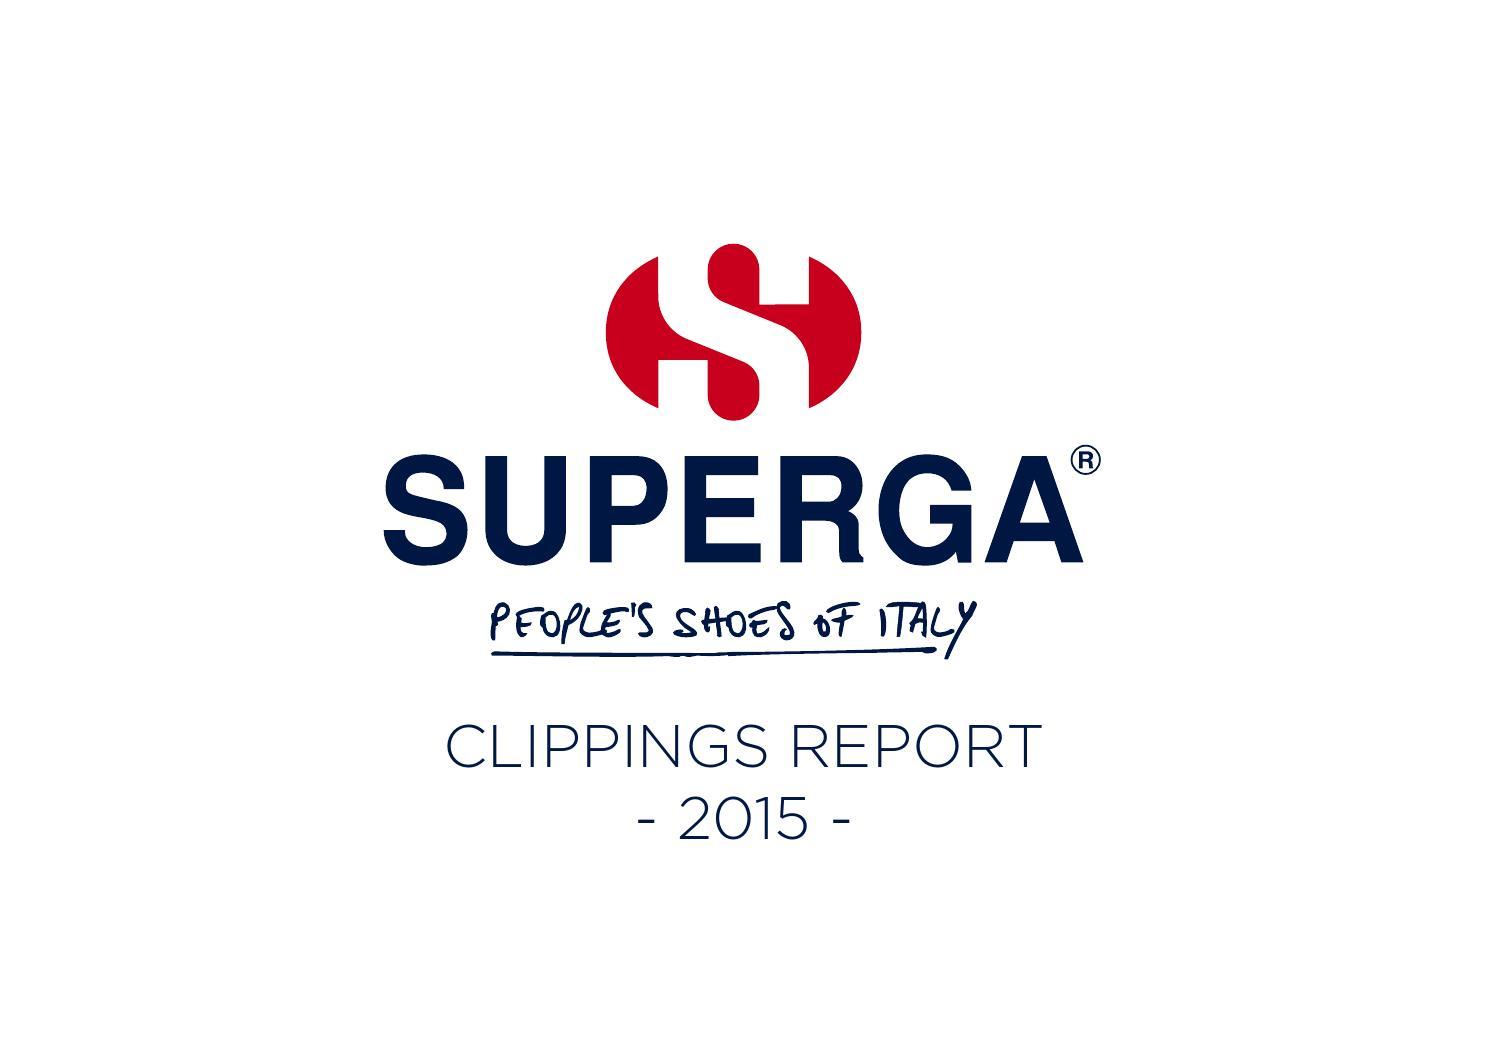 26befa29 Superga clippingsreport 2015 by Kraes Agency - issuu